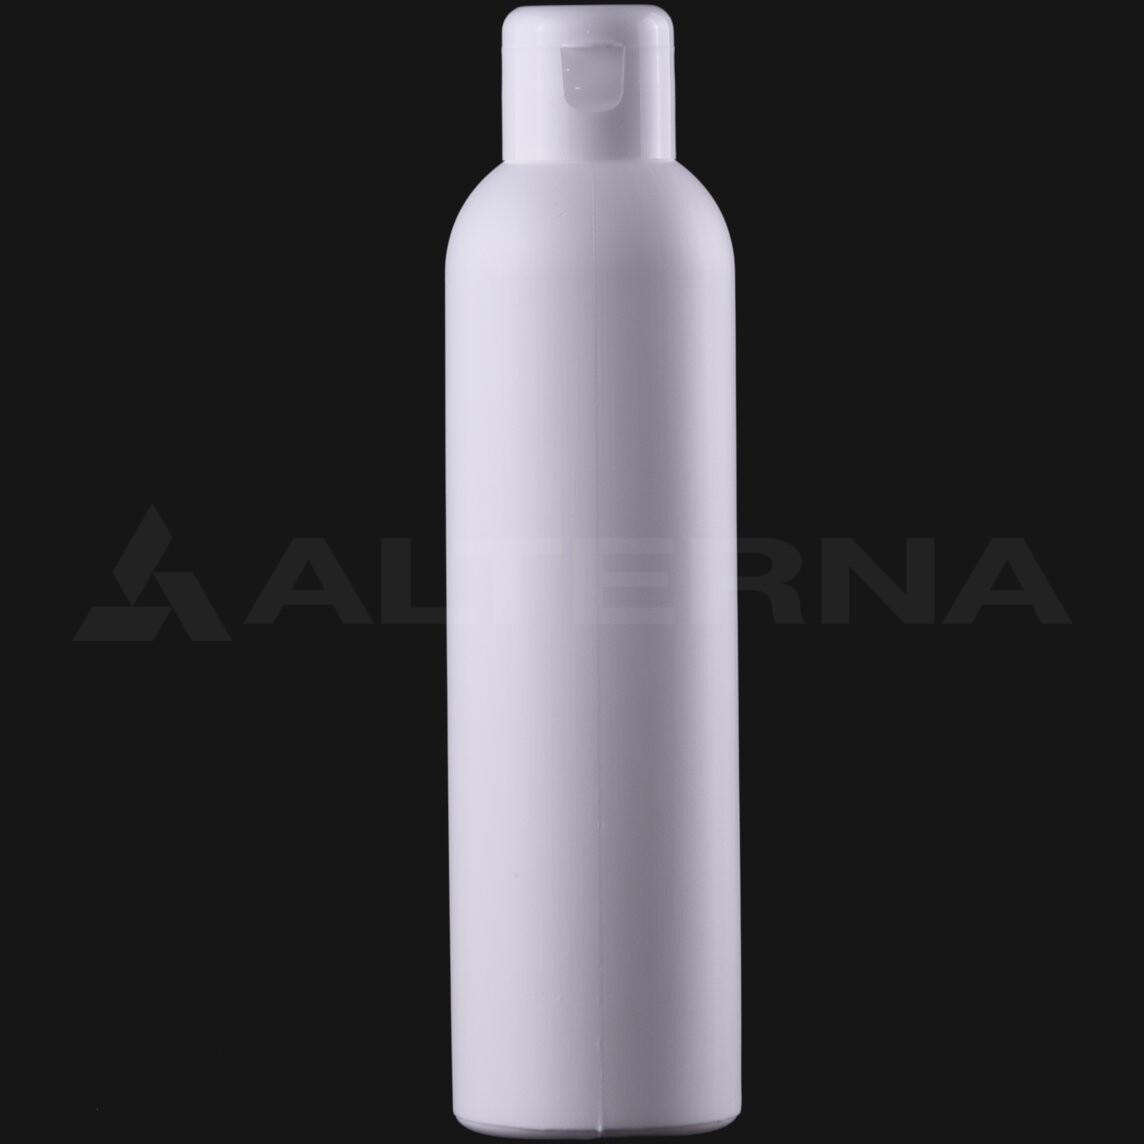 200 ml HDPE Bottle with 24 mm Flip Top Cap